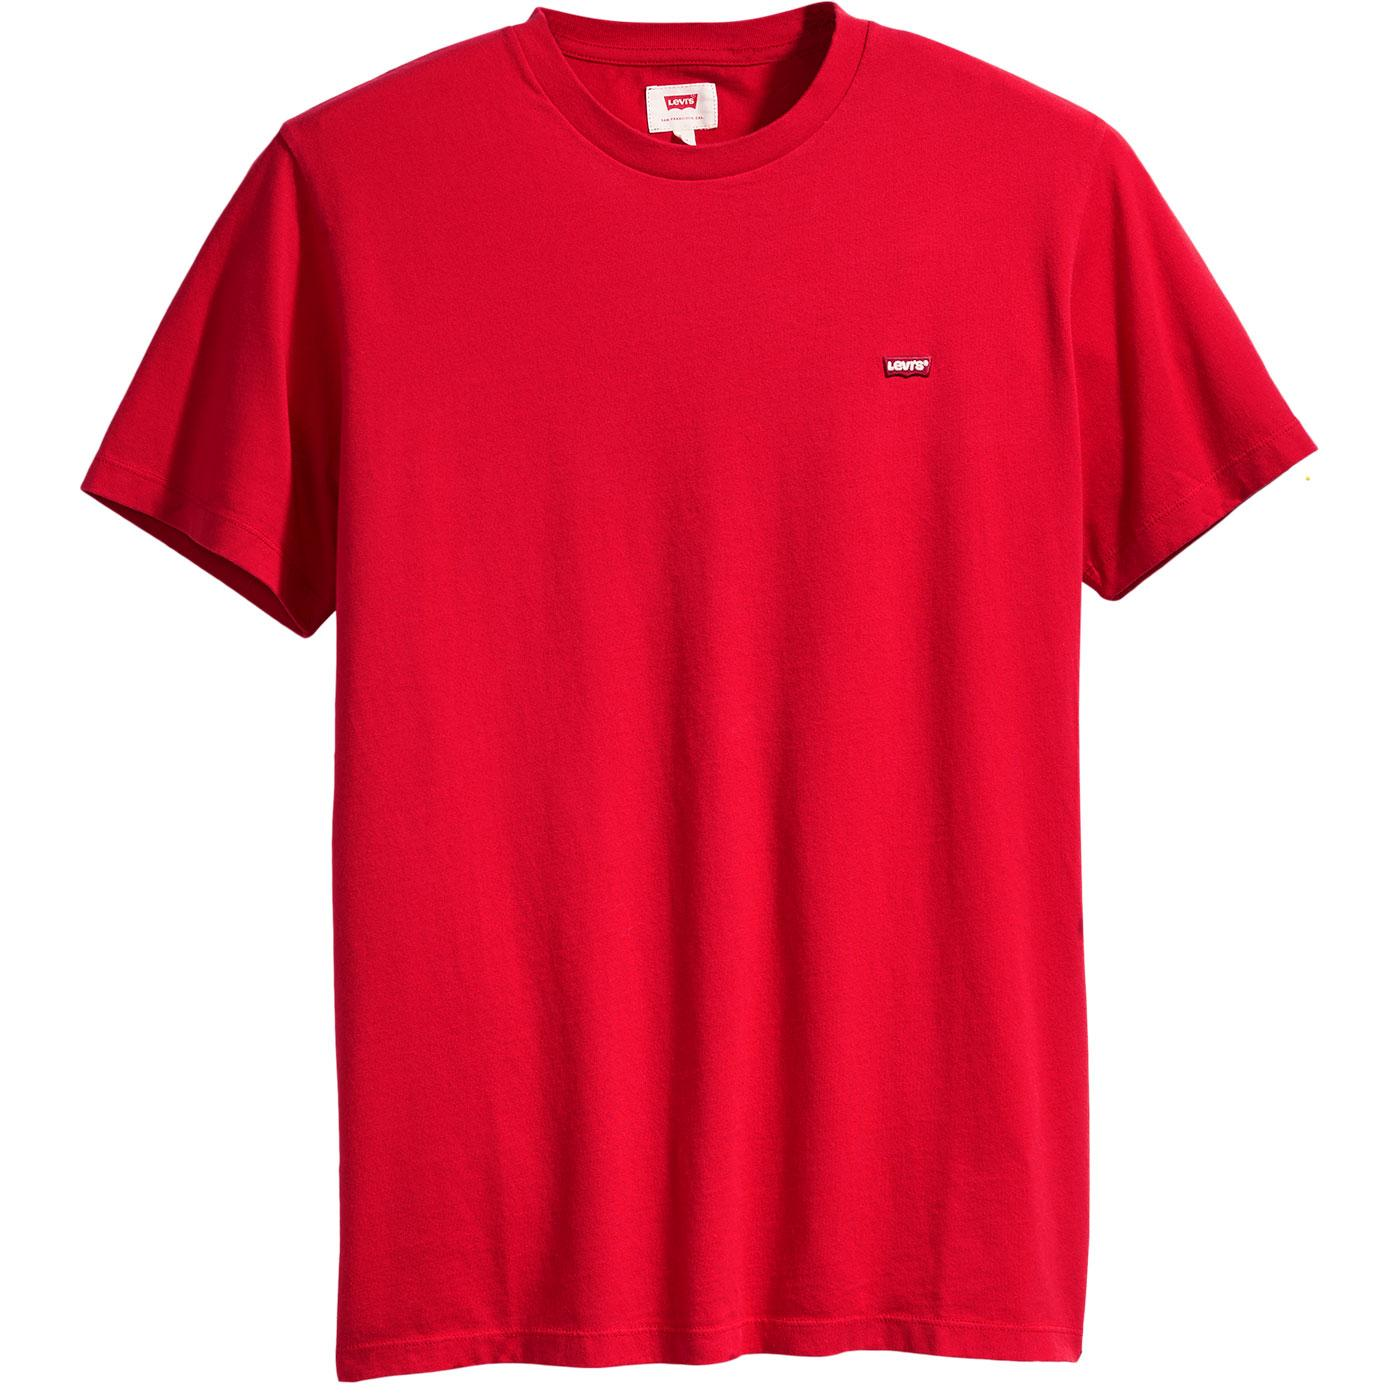 LEVI'S Original HM Small Logo Tee (Brilliant Red)